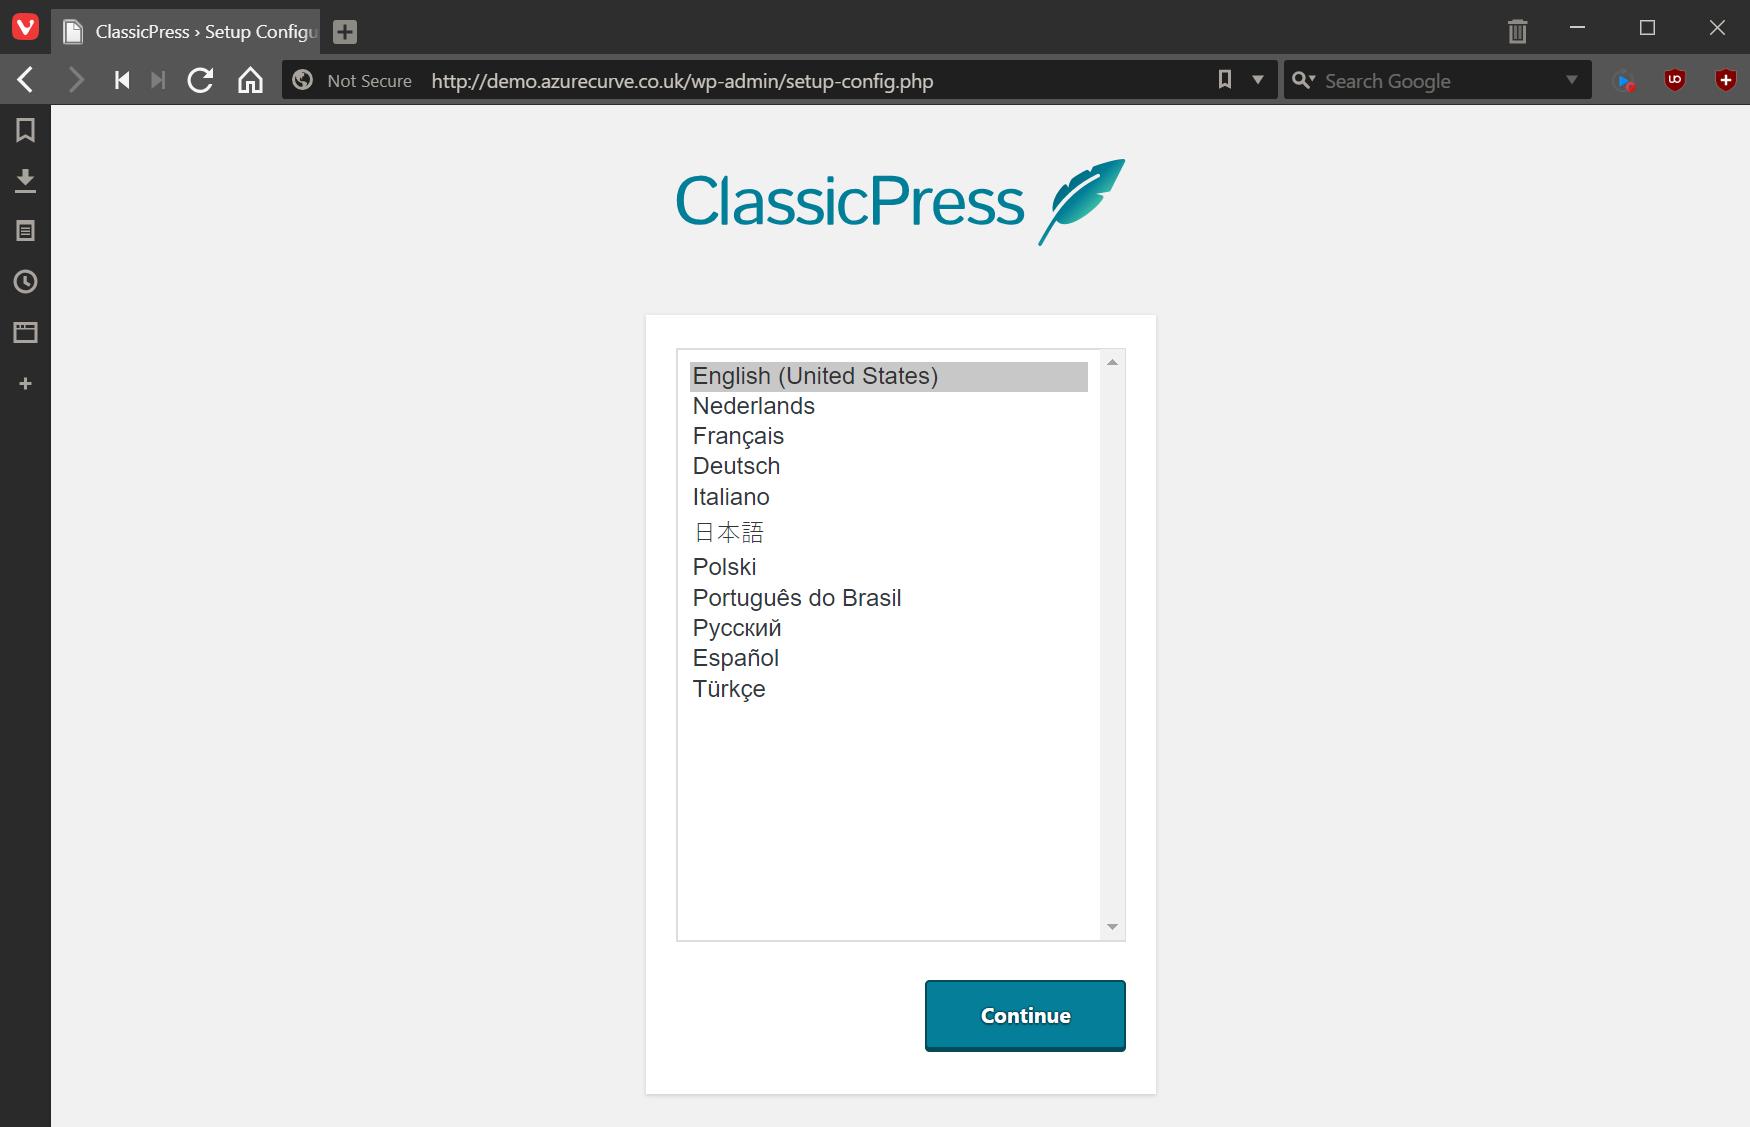 ClassicPress Setup Configuration